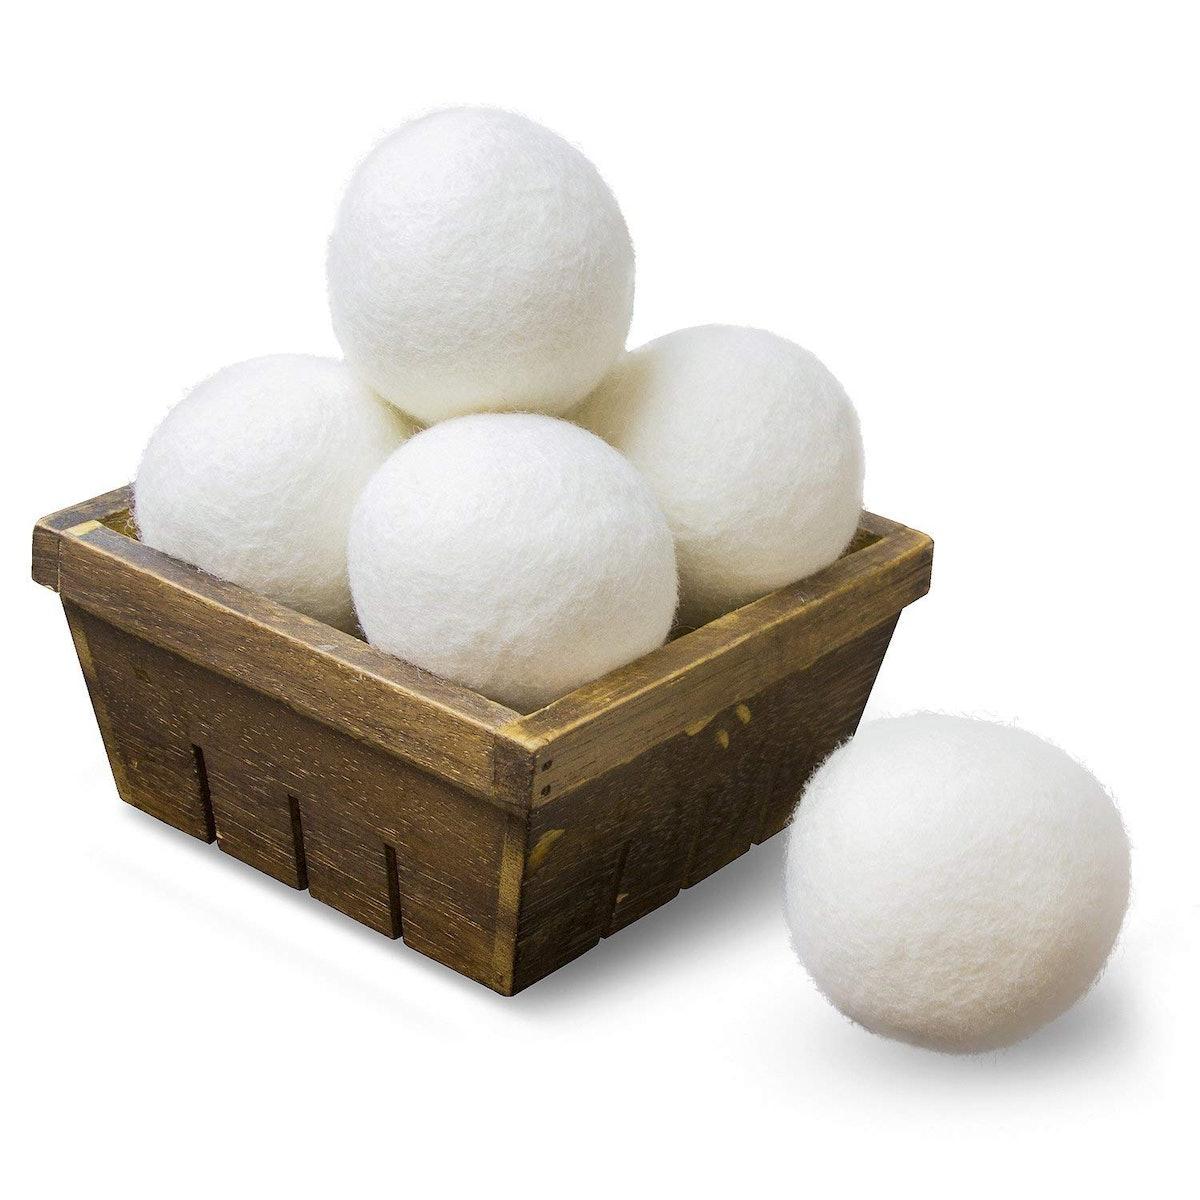 SnugPad Wool Dryer Balls